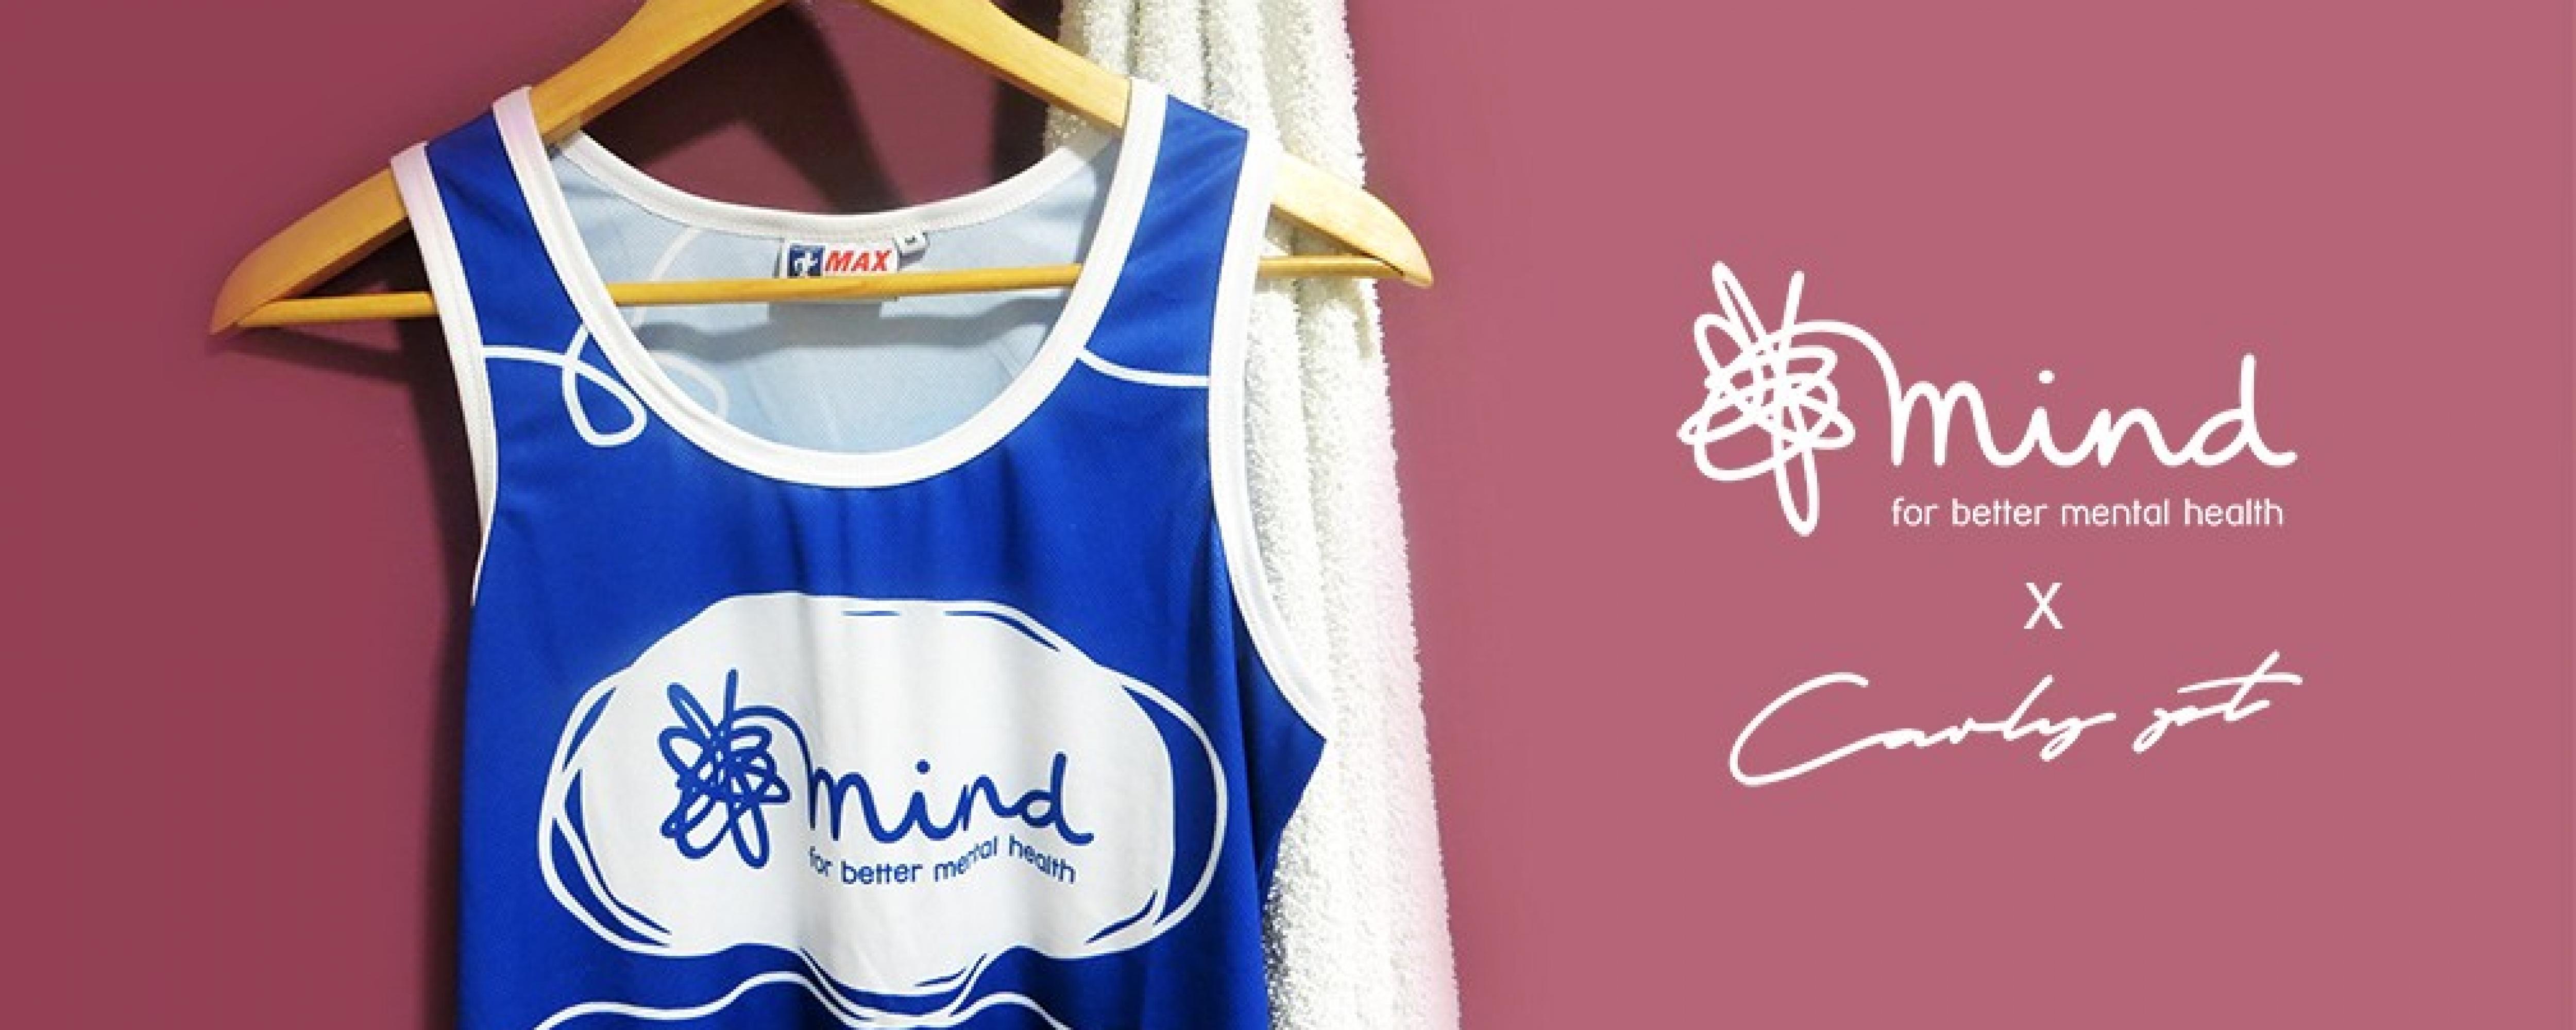 mind charity_WR1